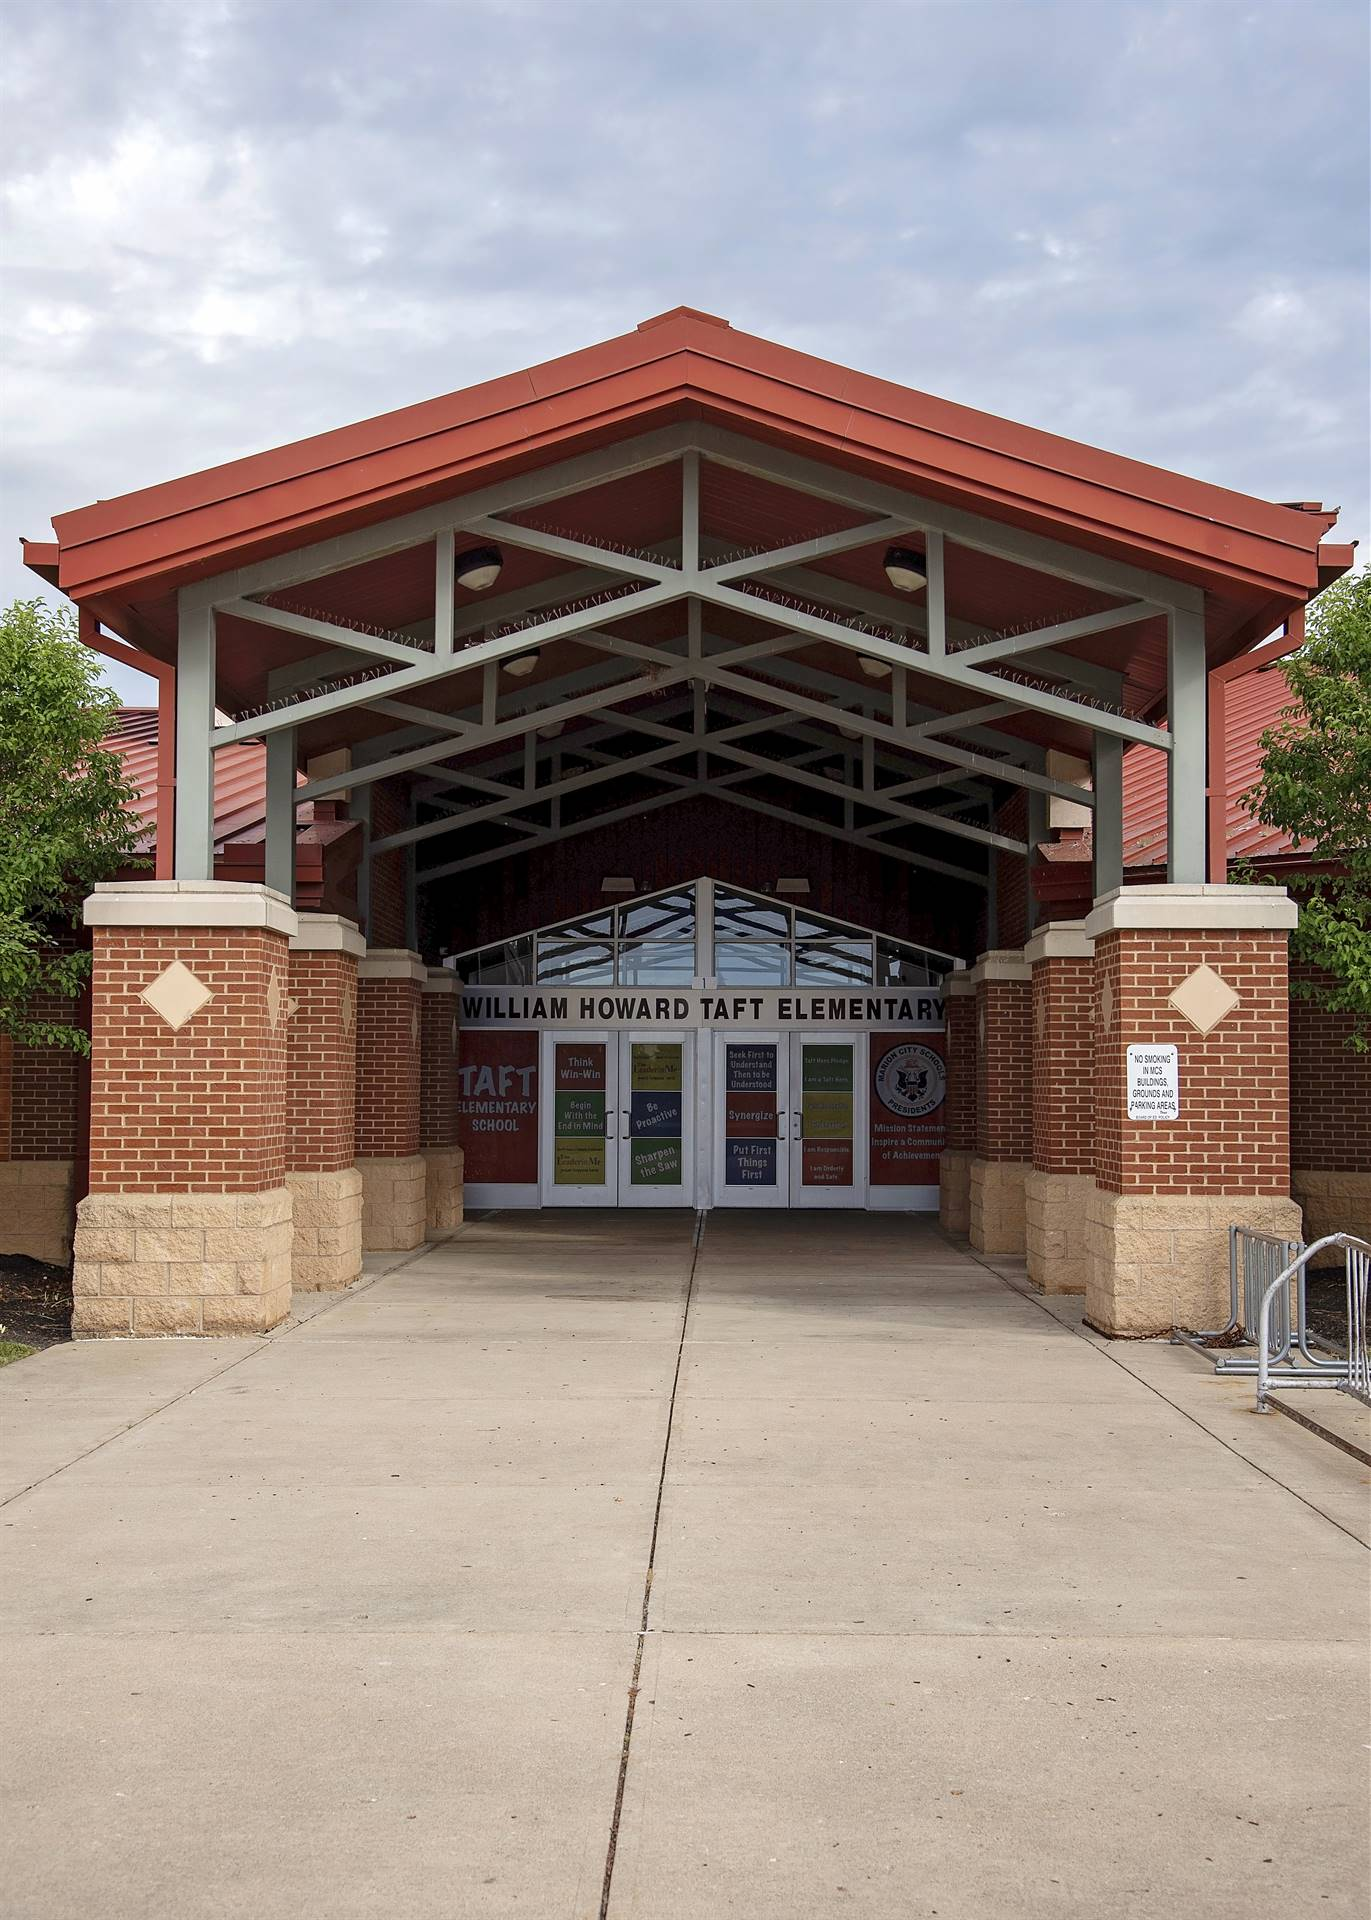 Taft Elementary